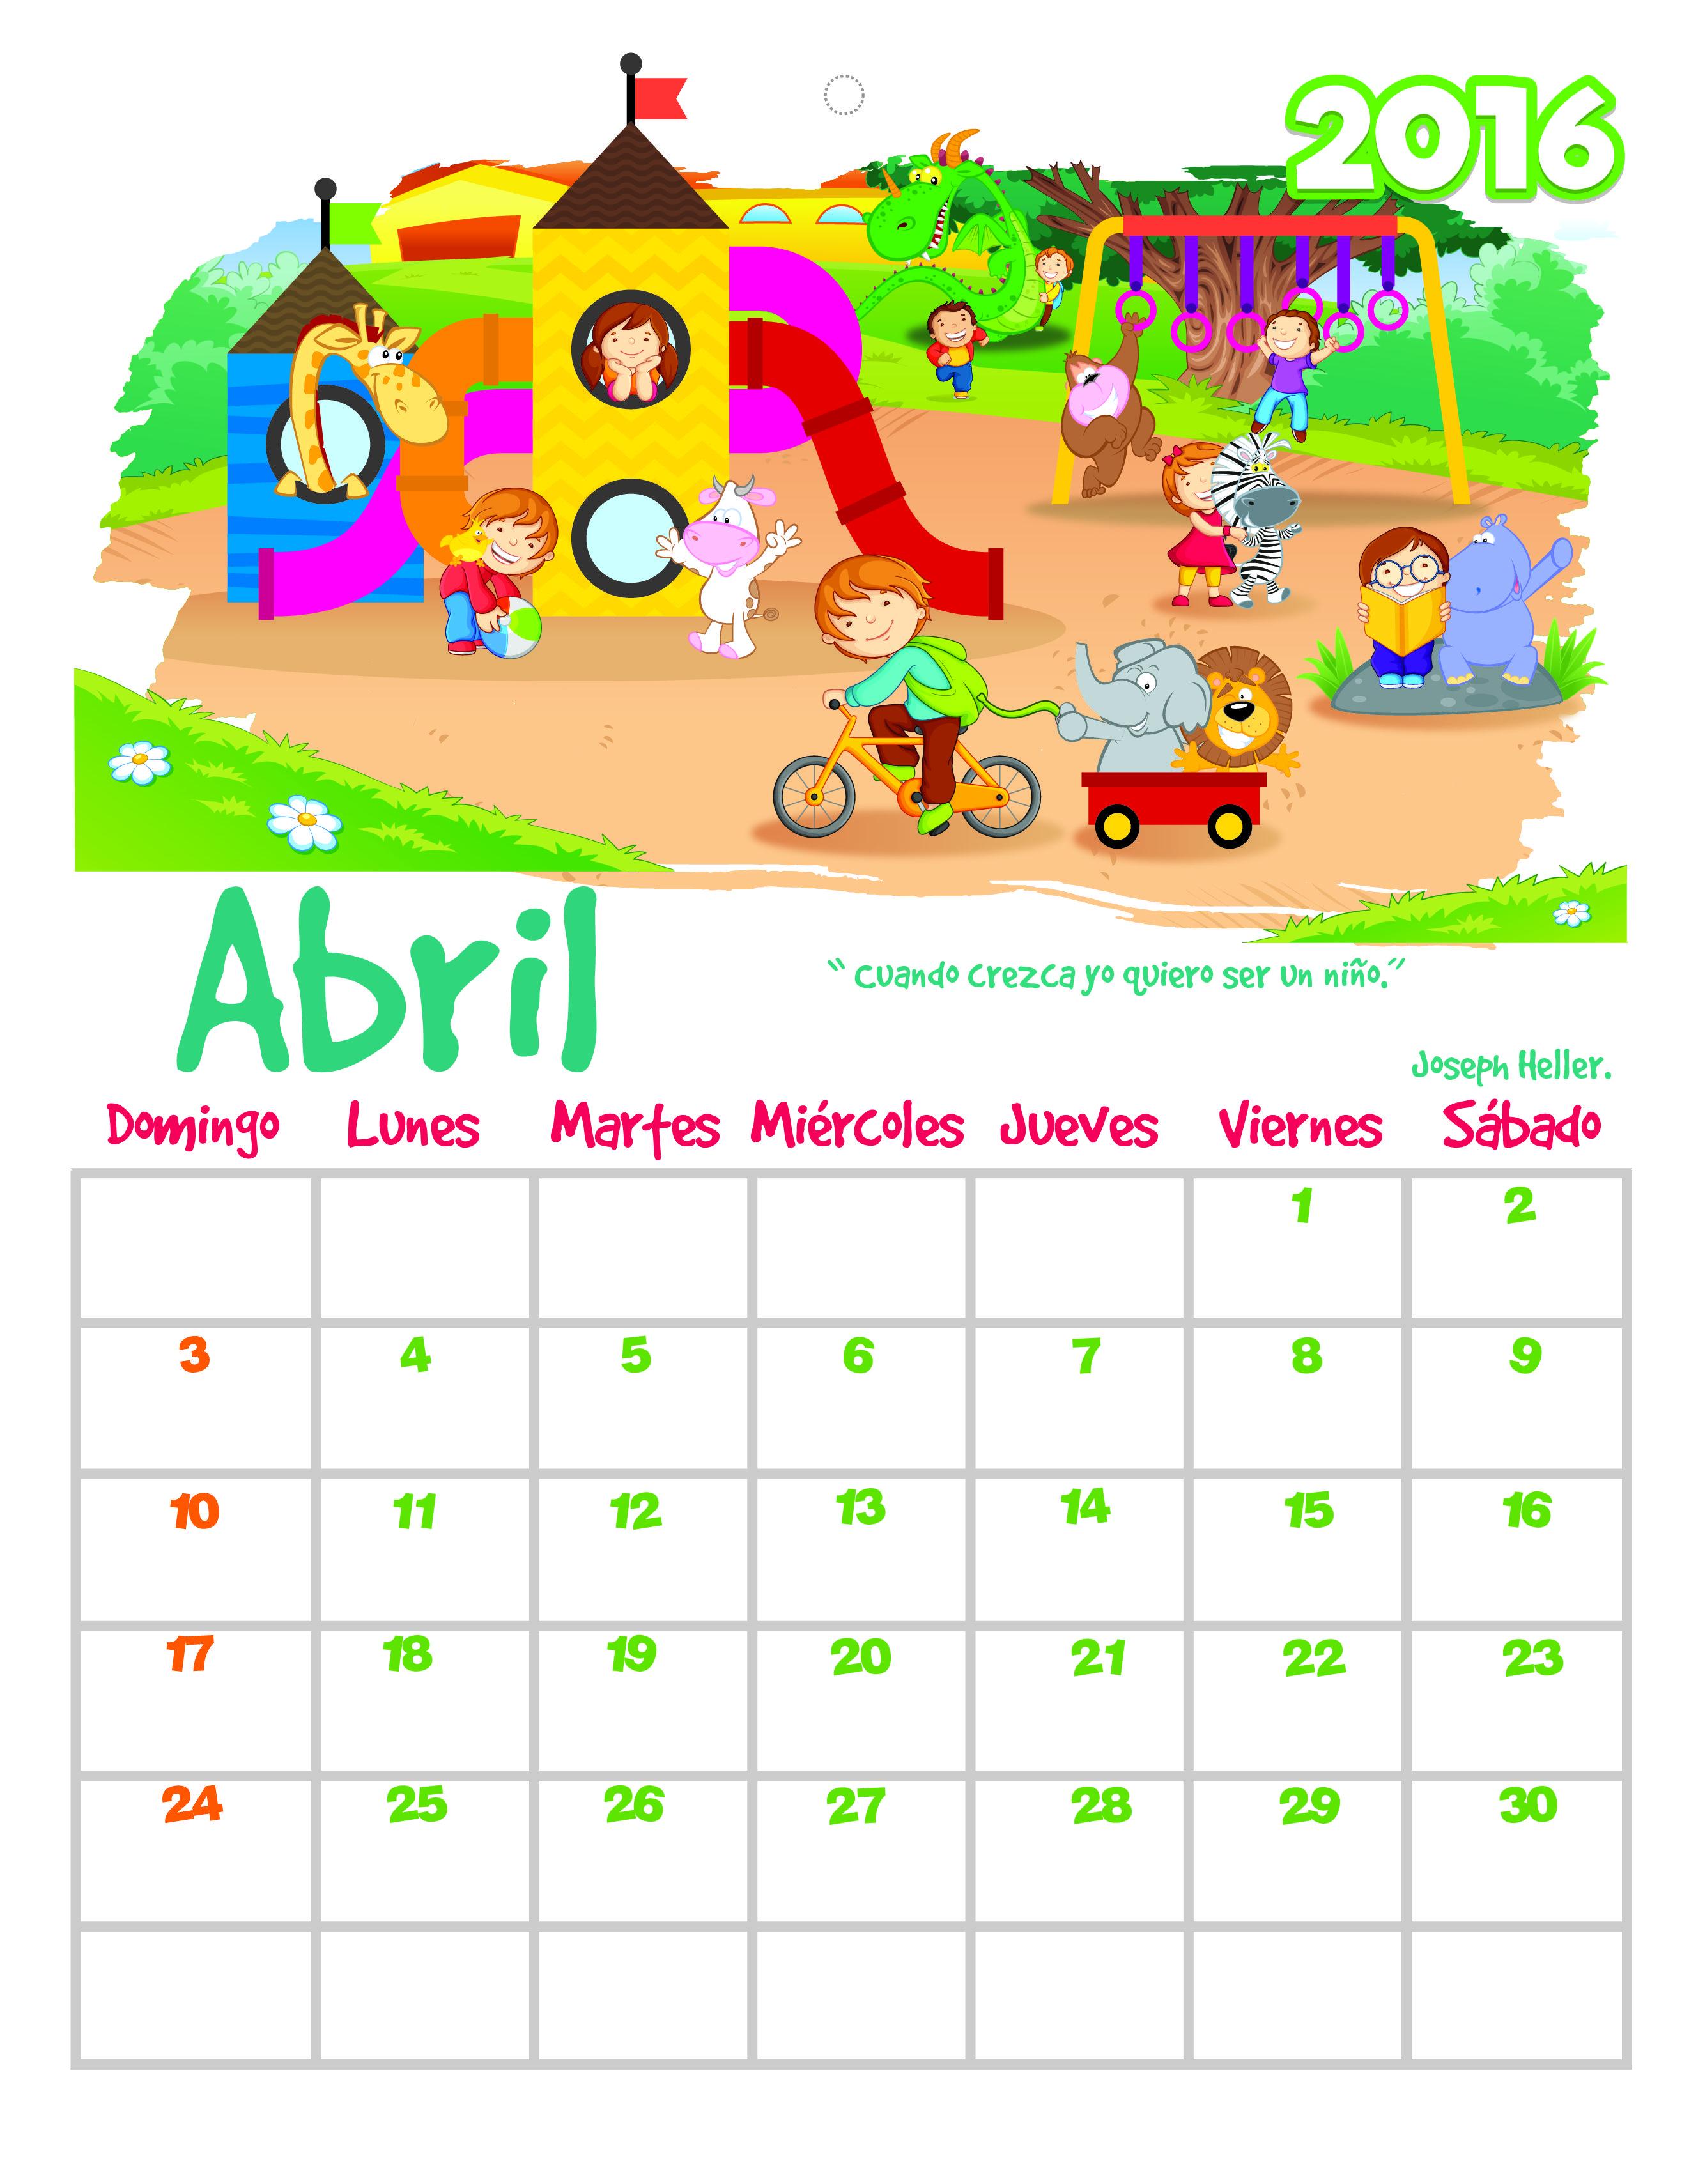 MARY RIOS (chechezayalex75) auf Pinterest